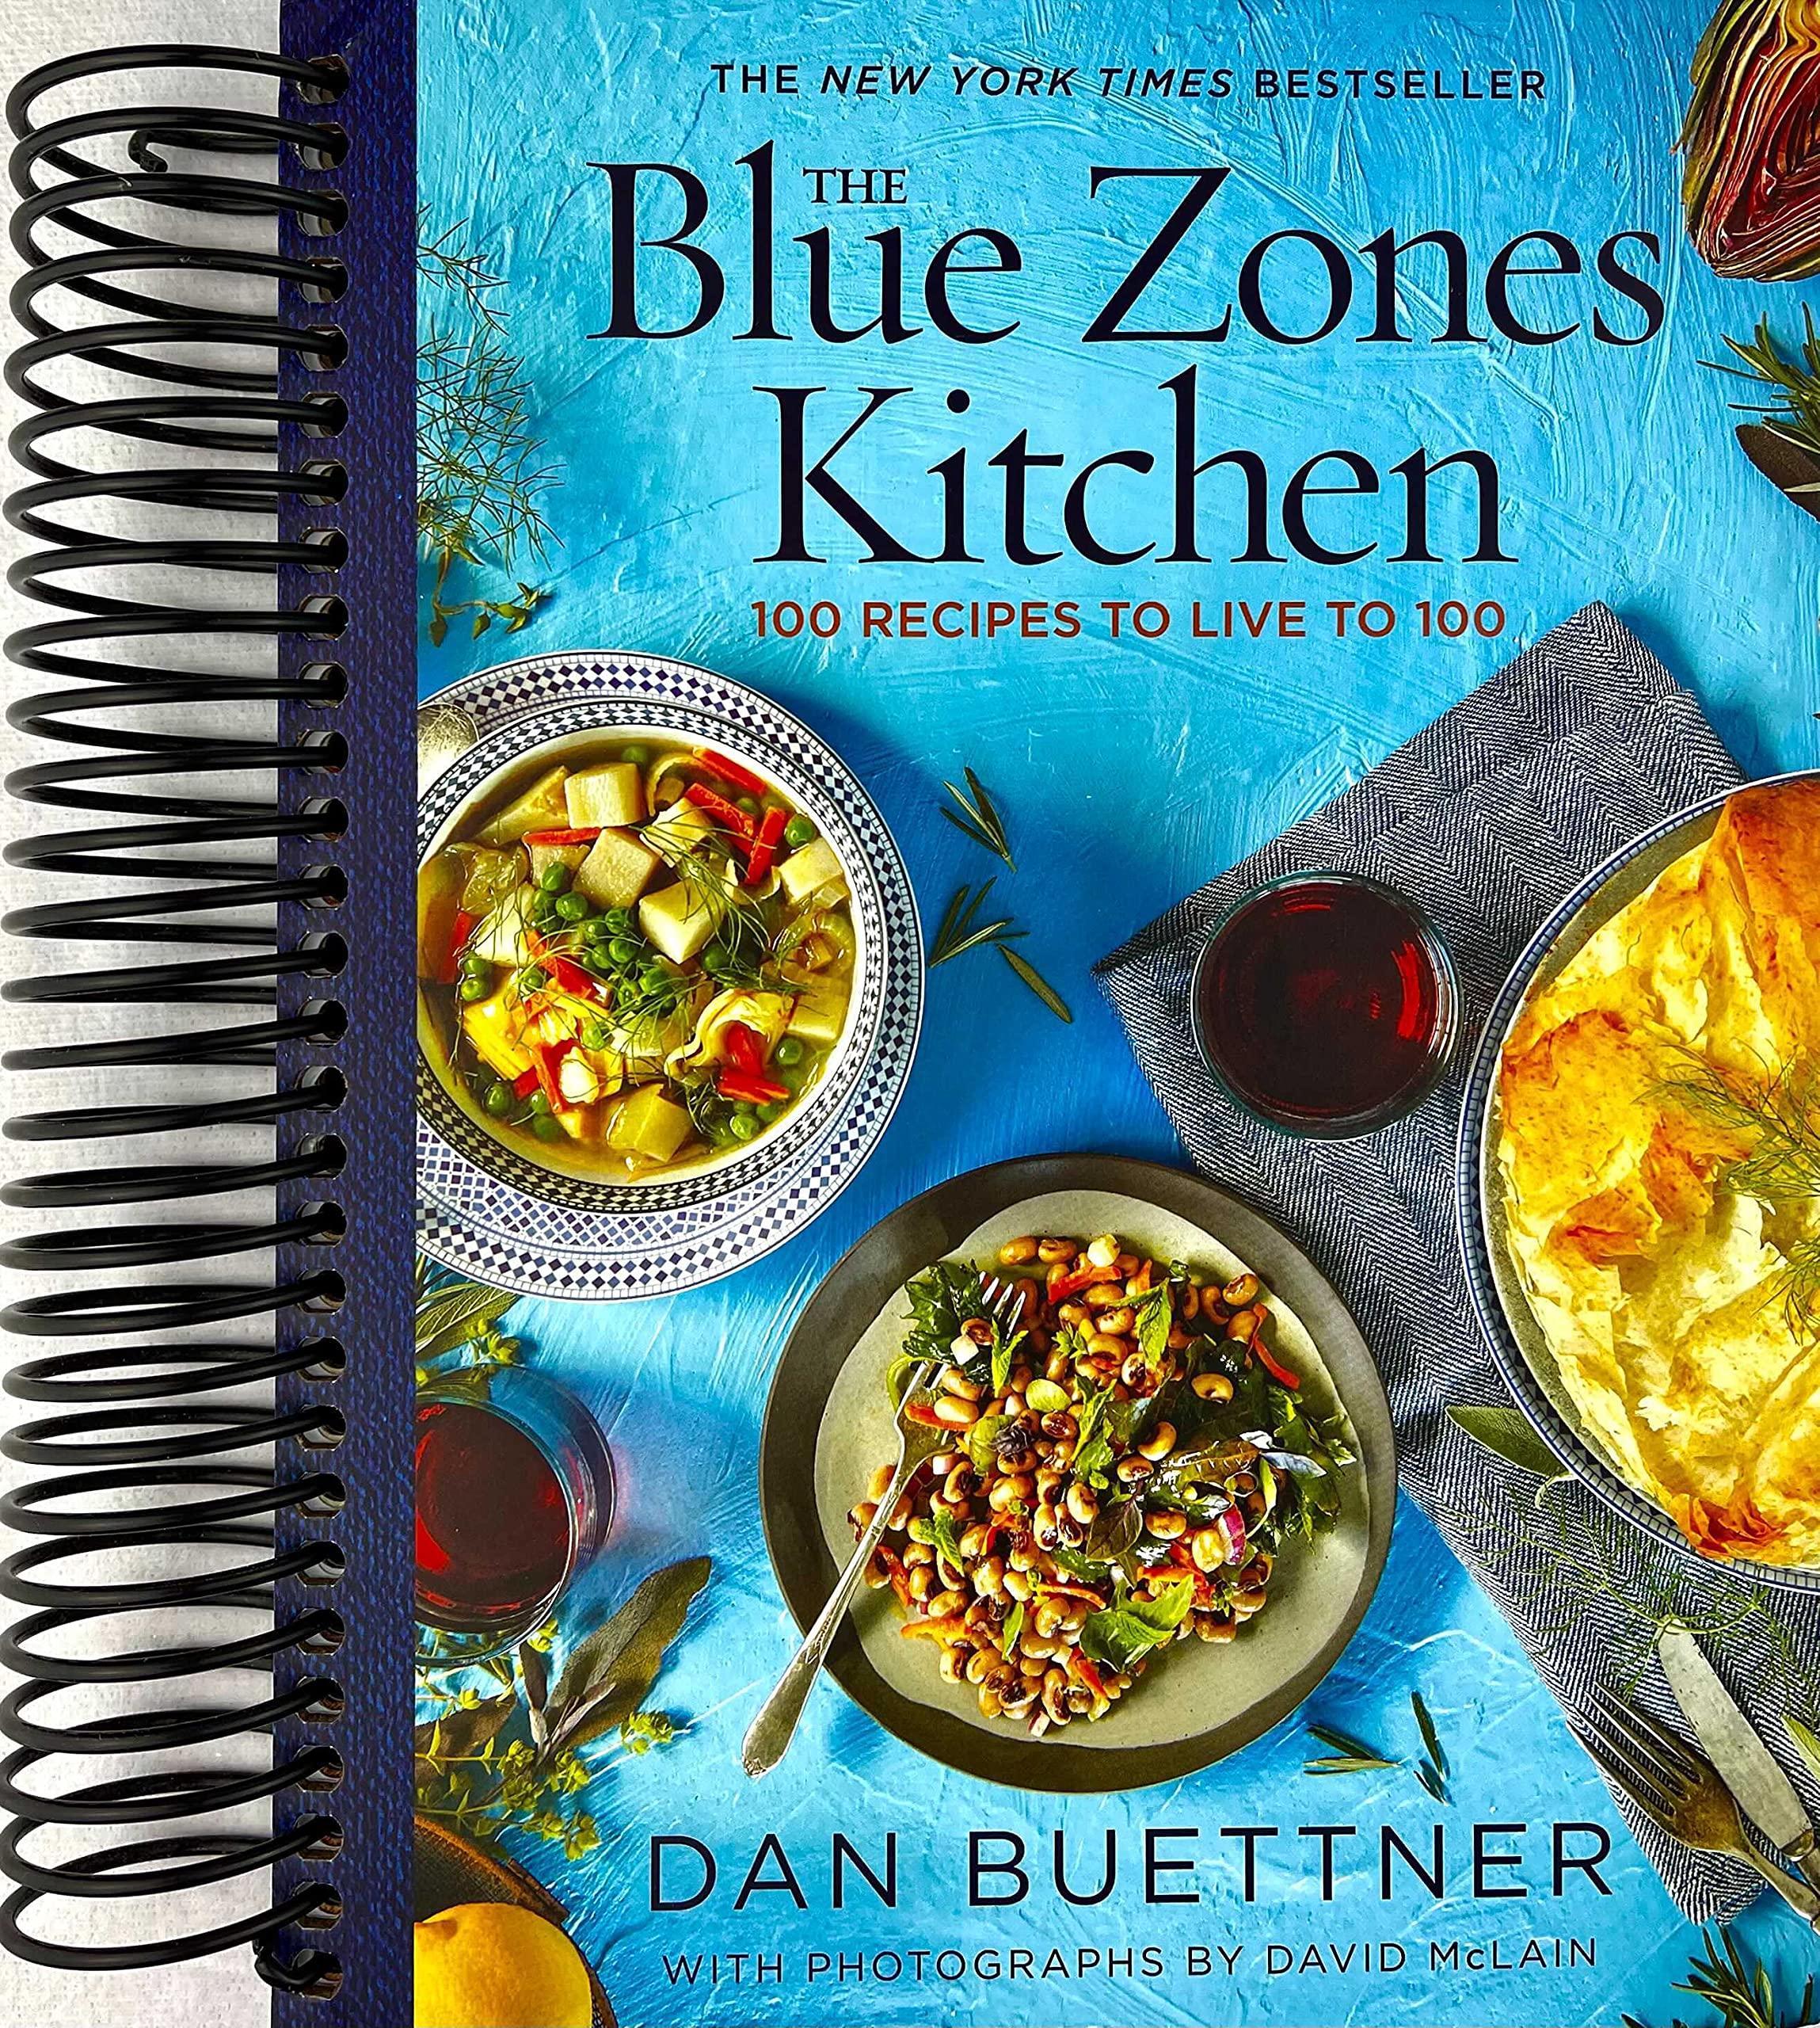 The Blue Zones Kitchen 100 Recipes To Live To 100 Dan Buettner Amazon Com Books